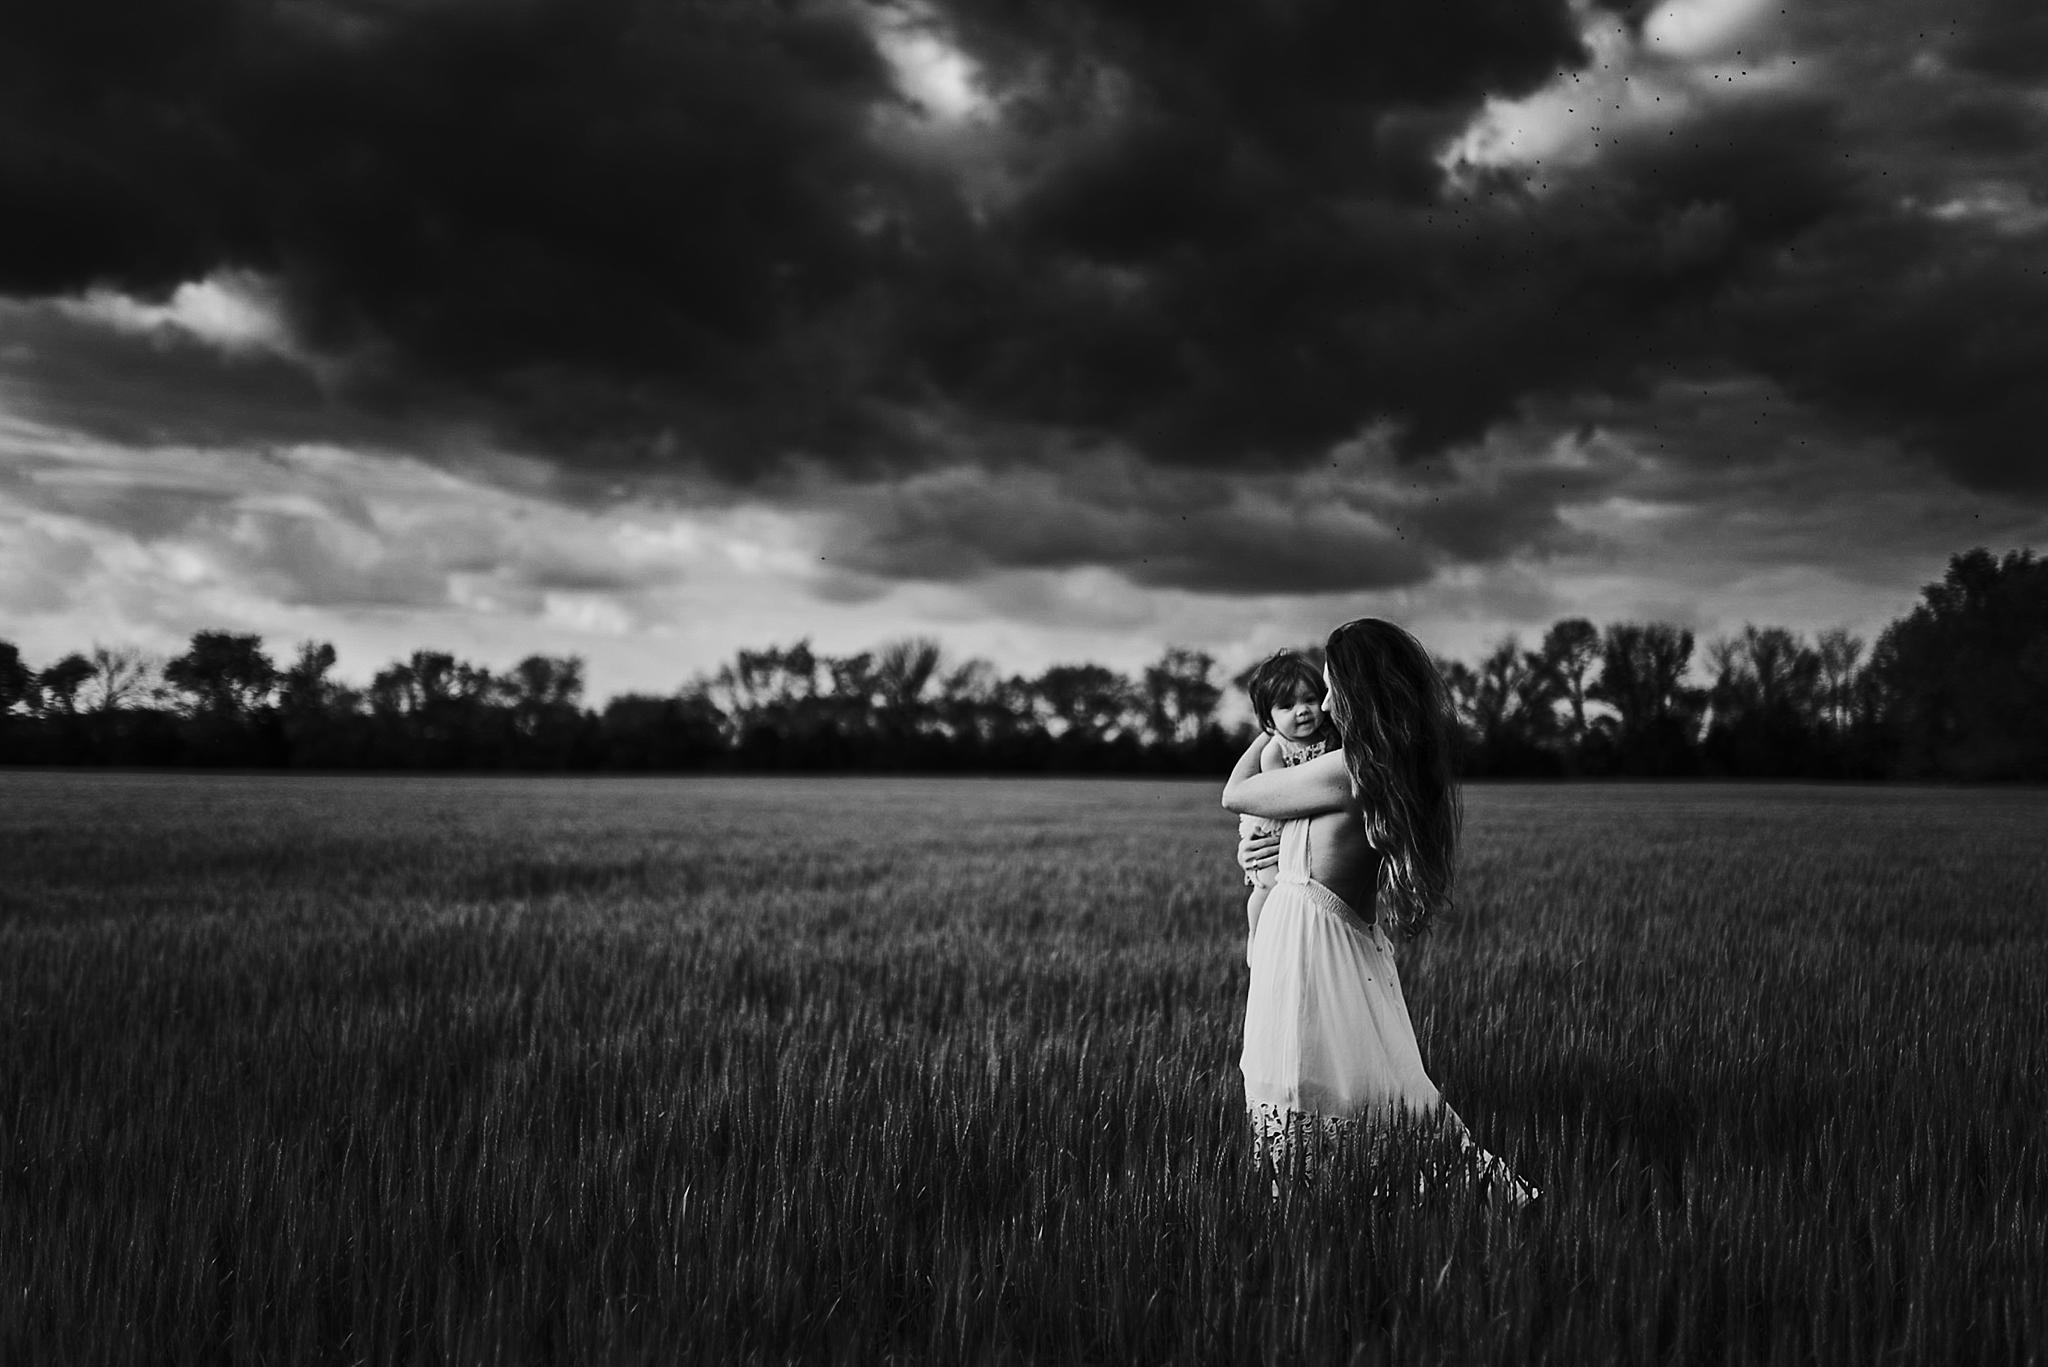 twyla jones photography - mother daughter - field and forest-4348_treasure coast florida.jpg